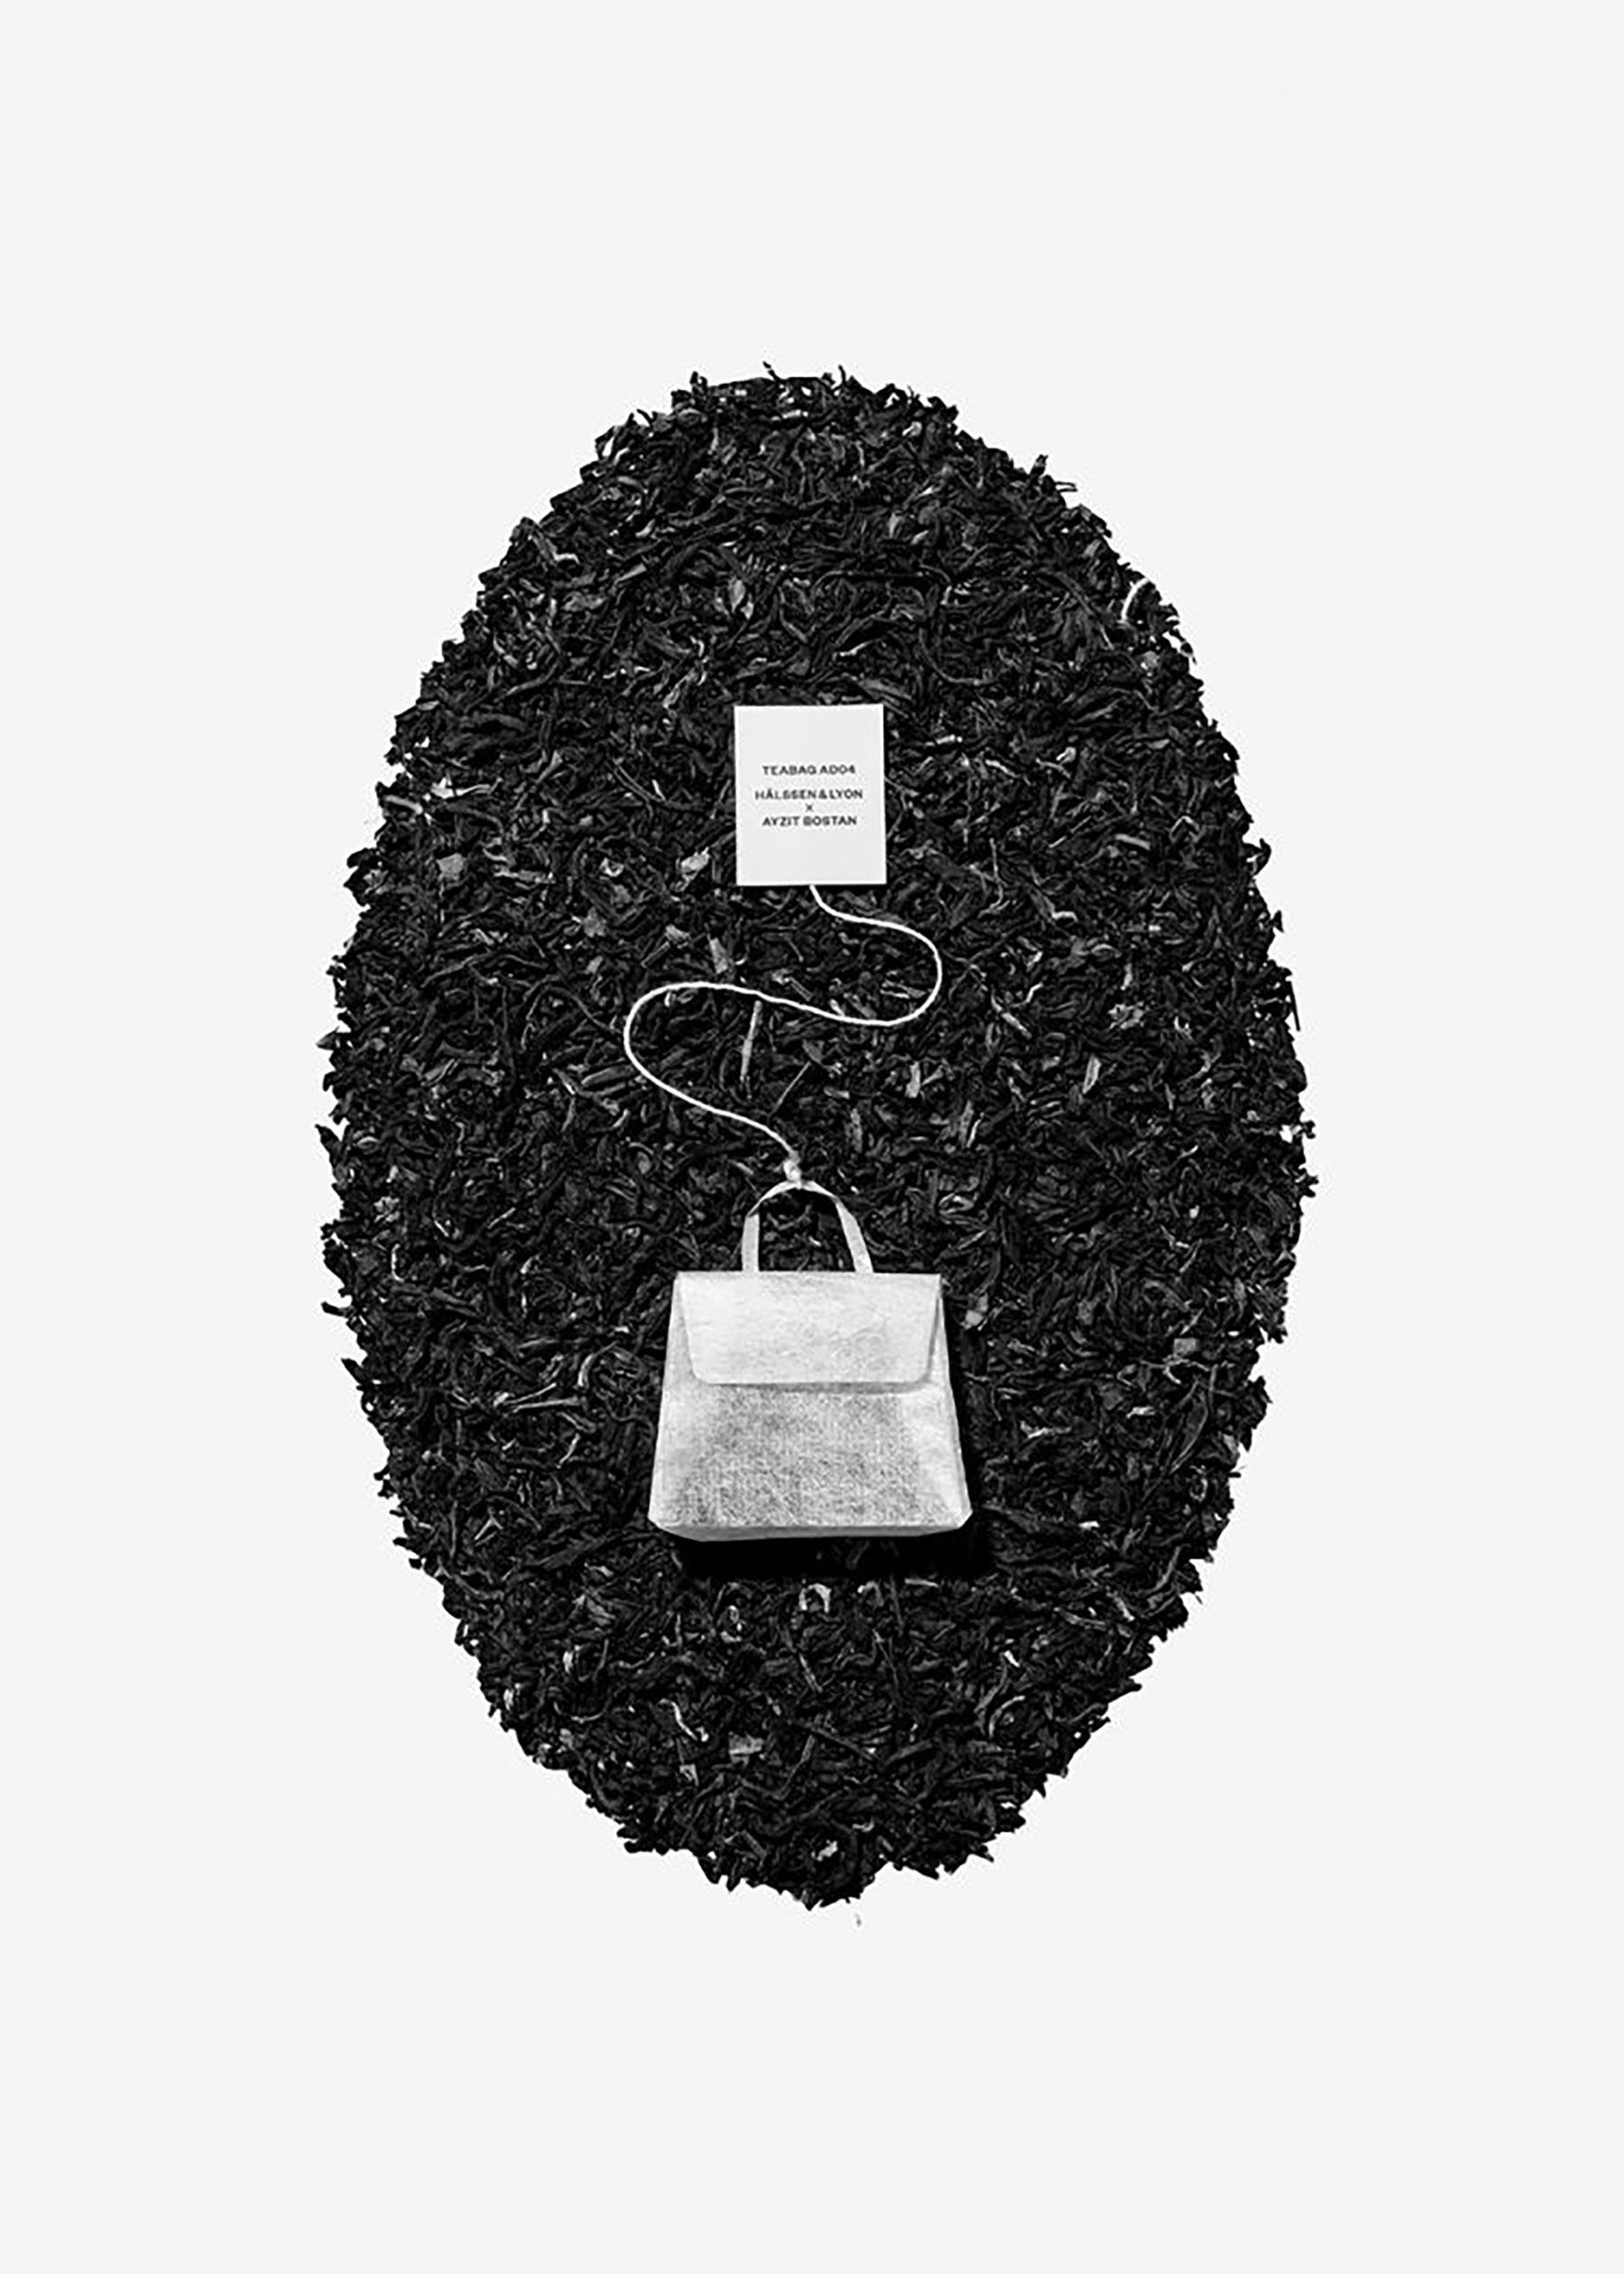 iGNANT-Design-Halssen-&-Lyon-Ayzit-Bostan-The-Teabag-Collection-14